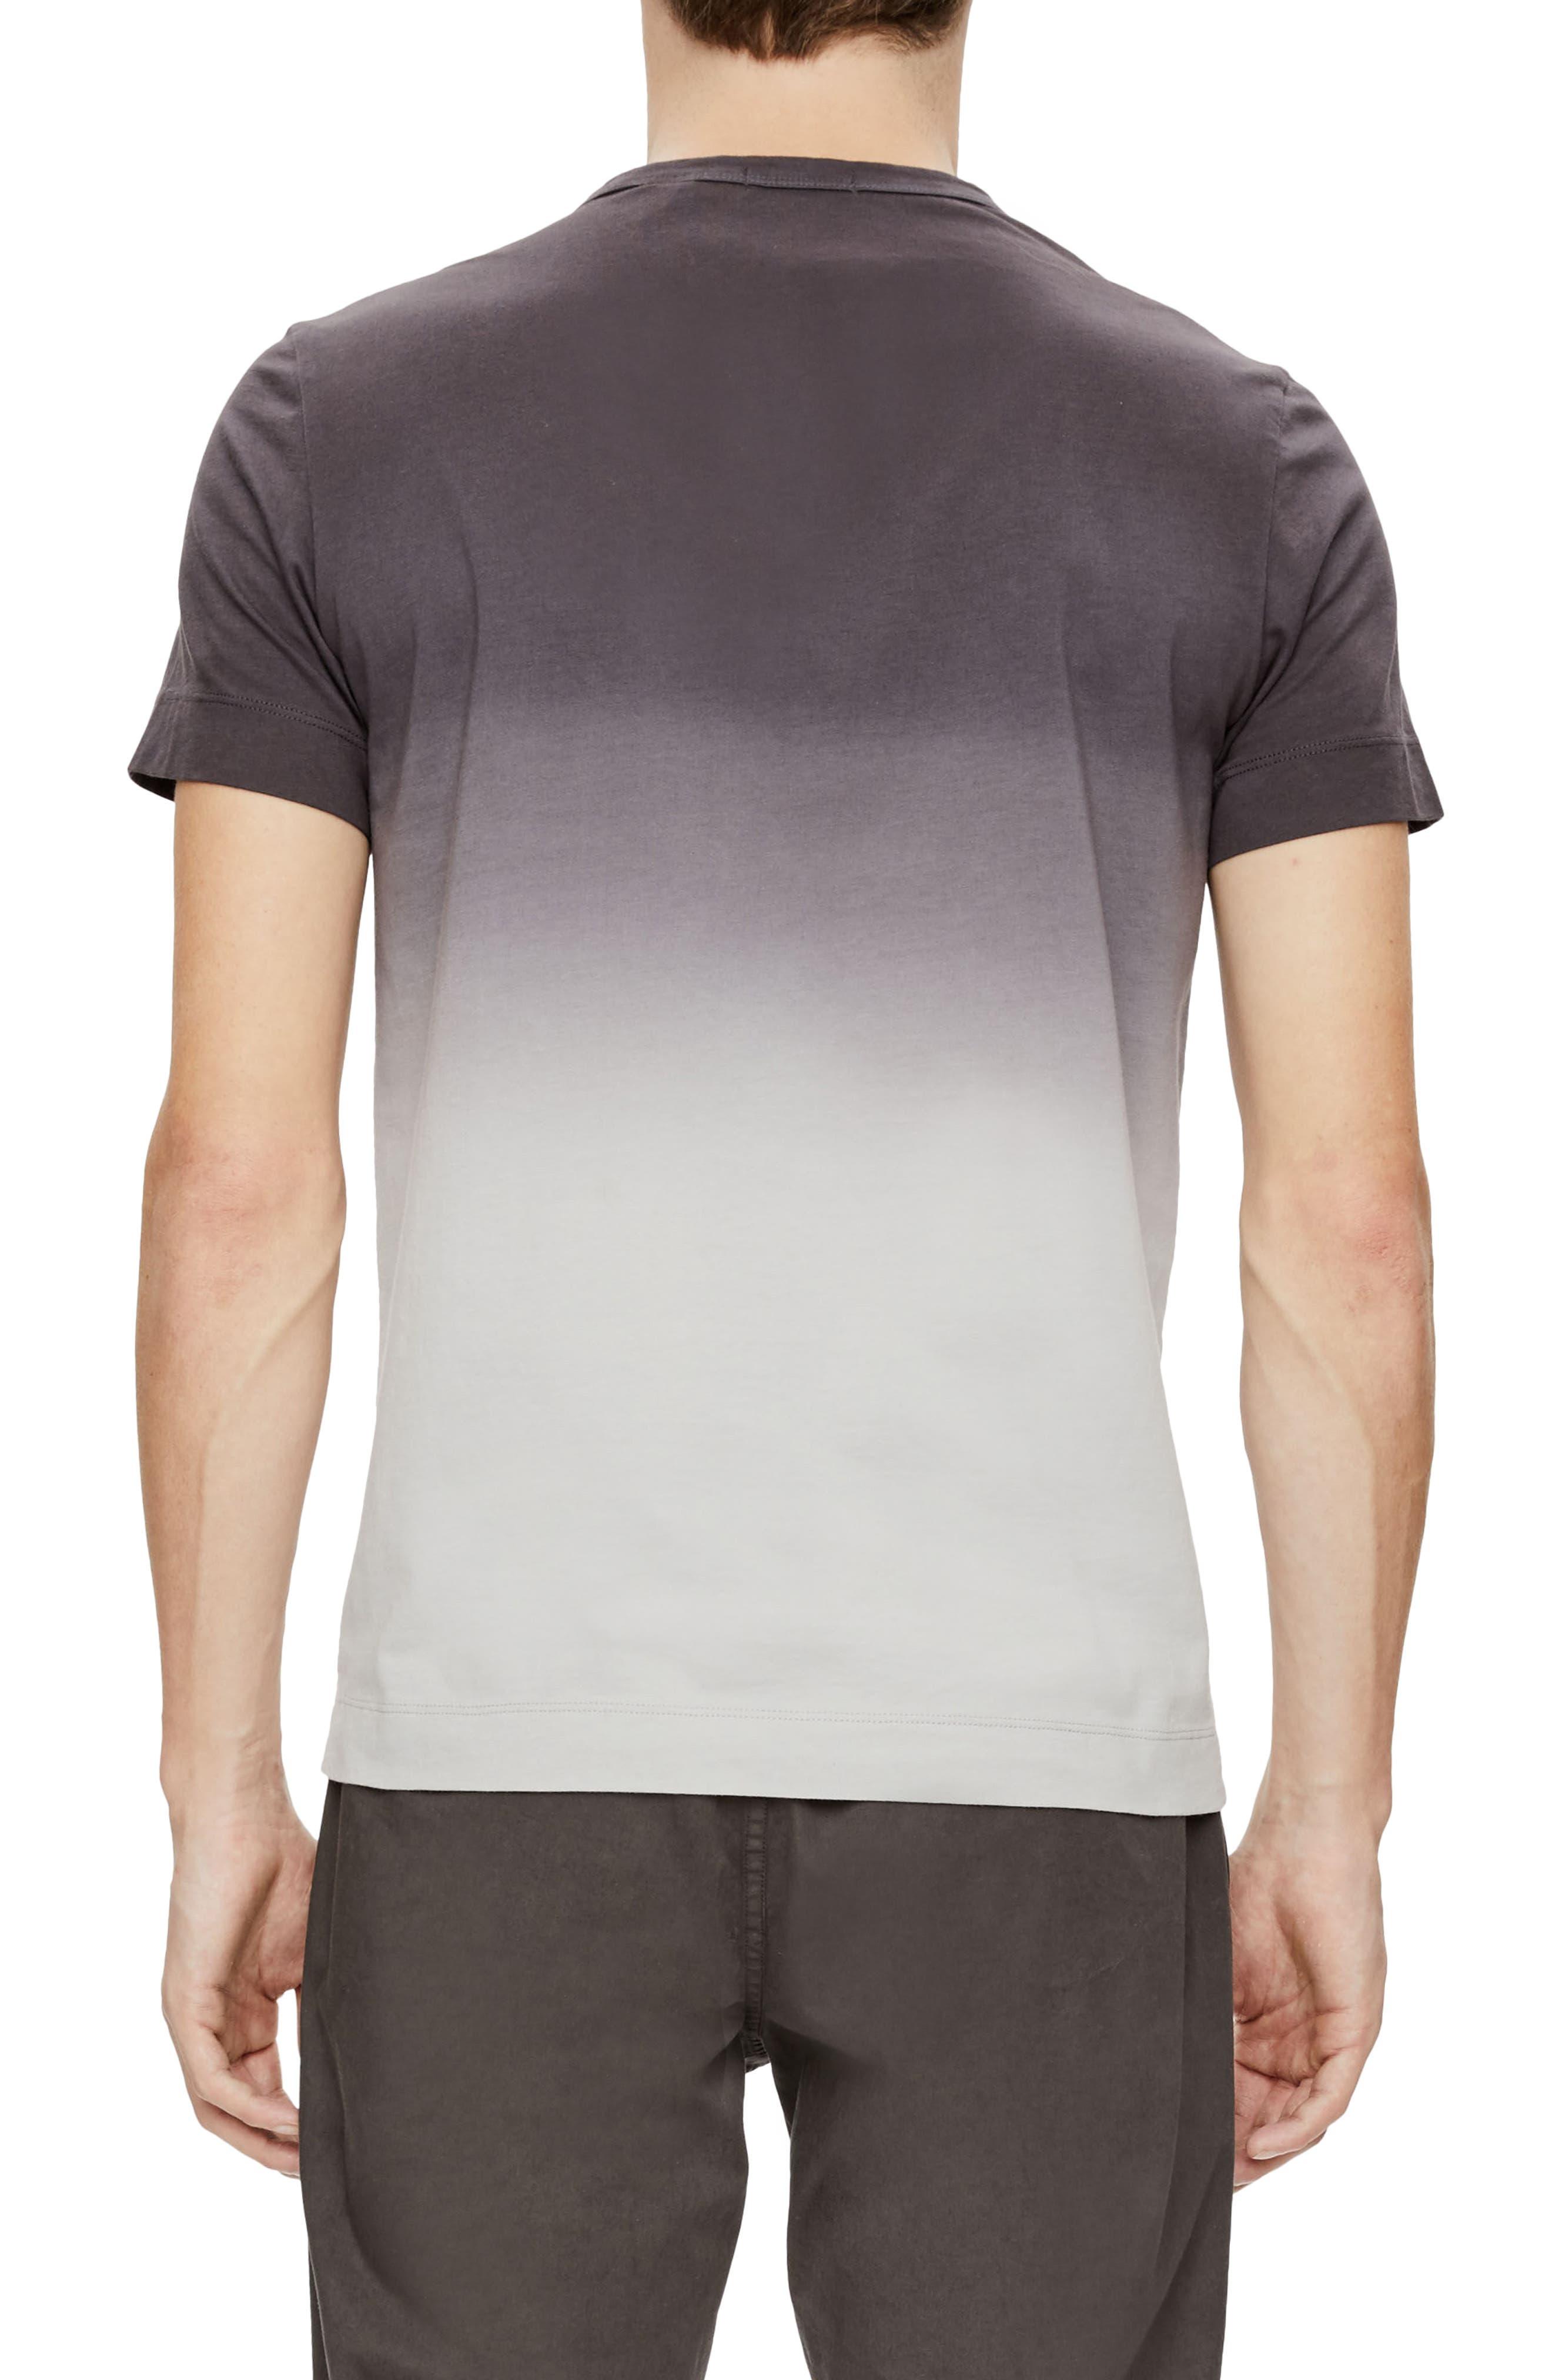 Gaskell Dip Dye Ombré T-Shirt,                             Alternate thumbnail 2, color,                             082